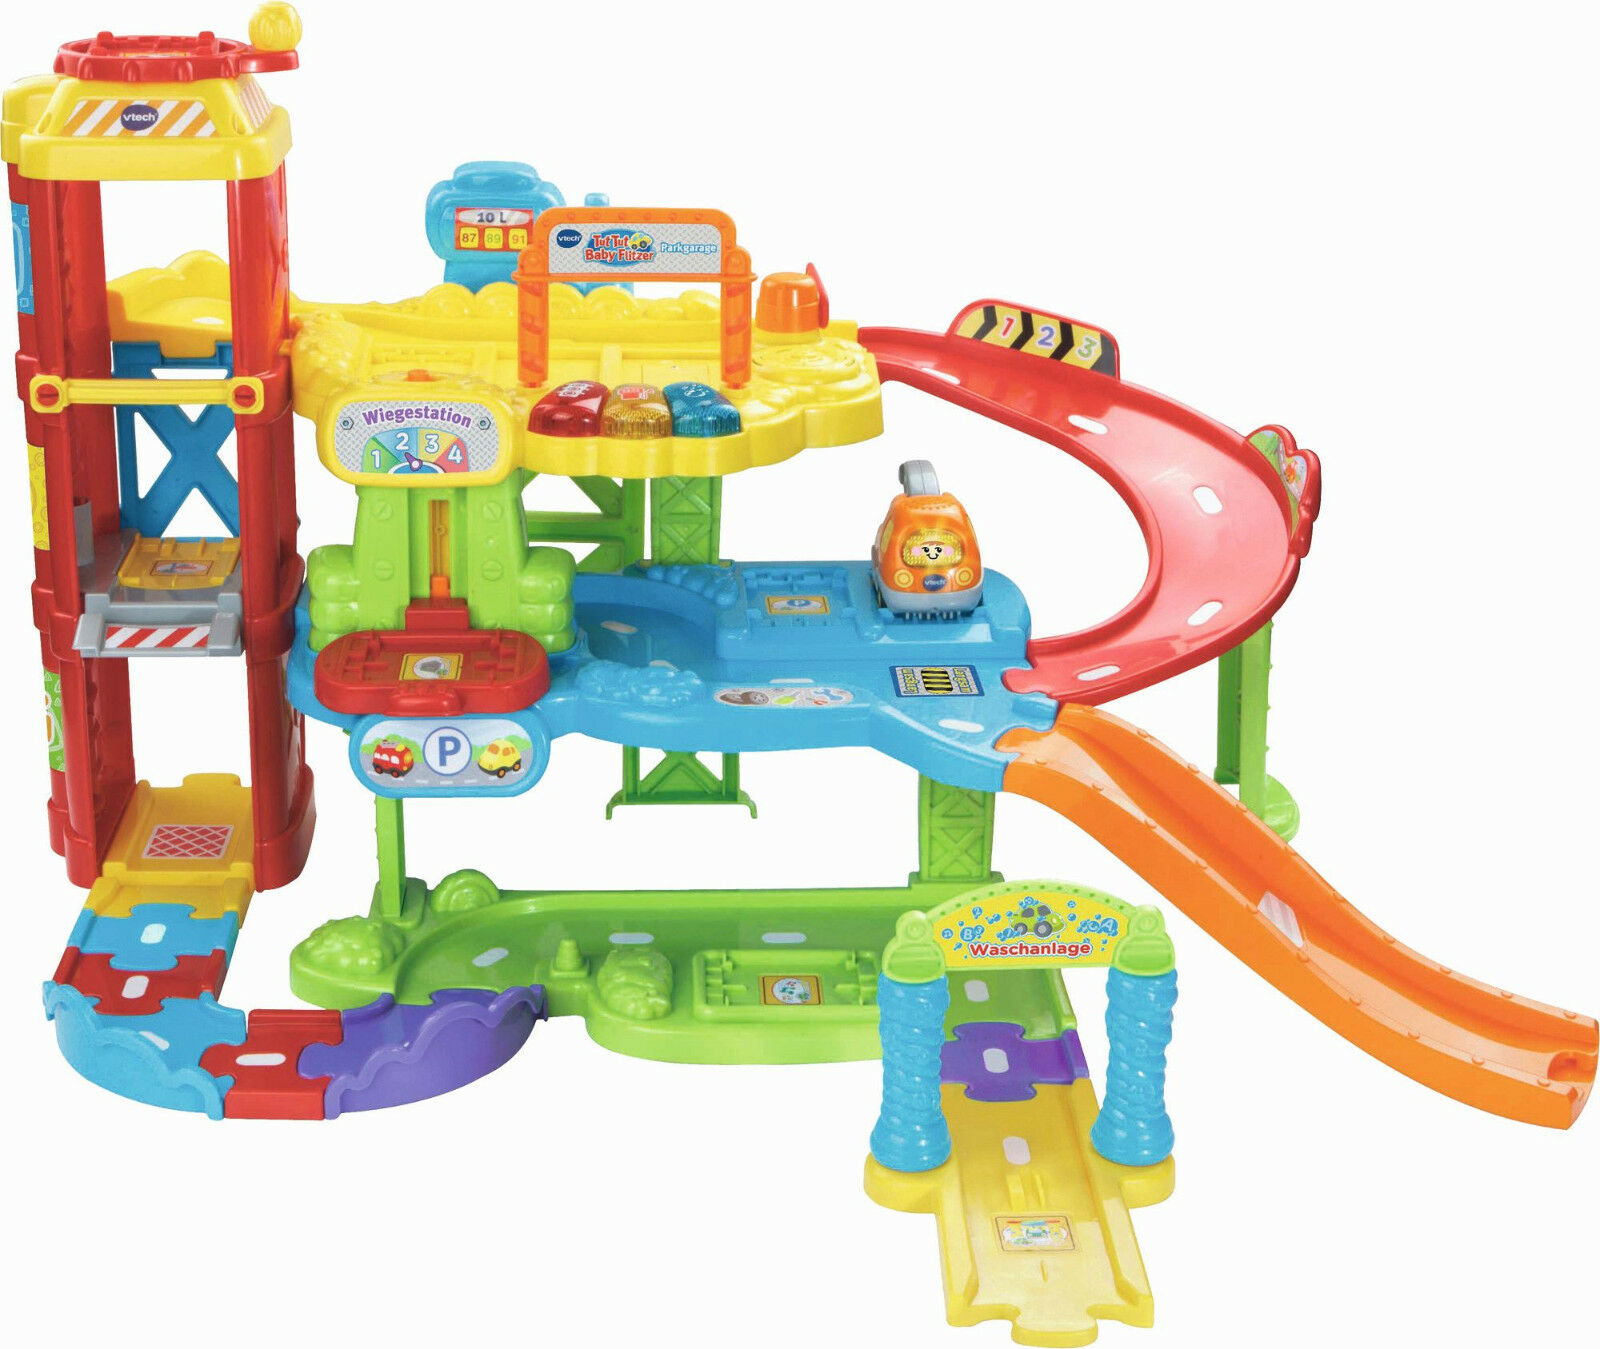 Vtech 180004 - Park Garage, Tut Tut Baby Flitzer, Nip